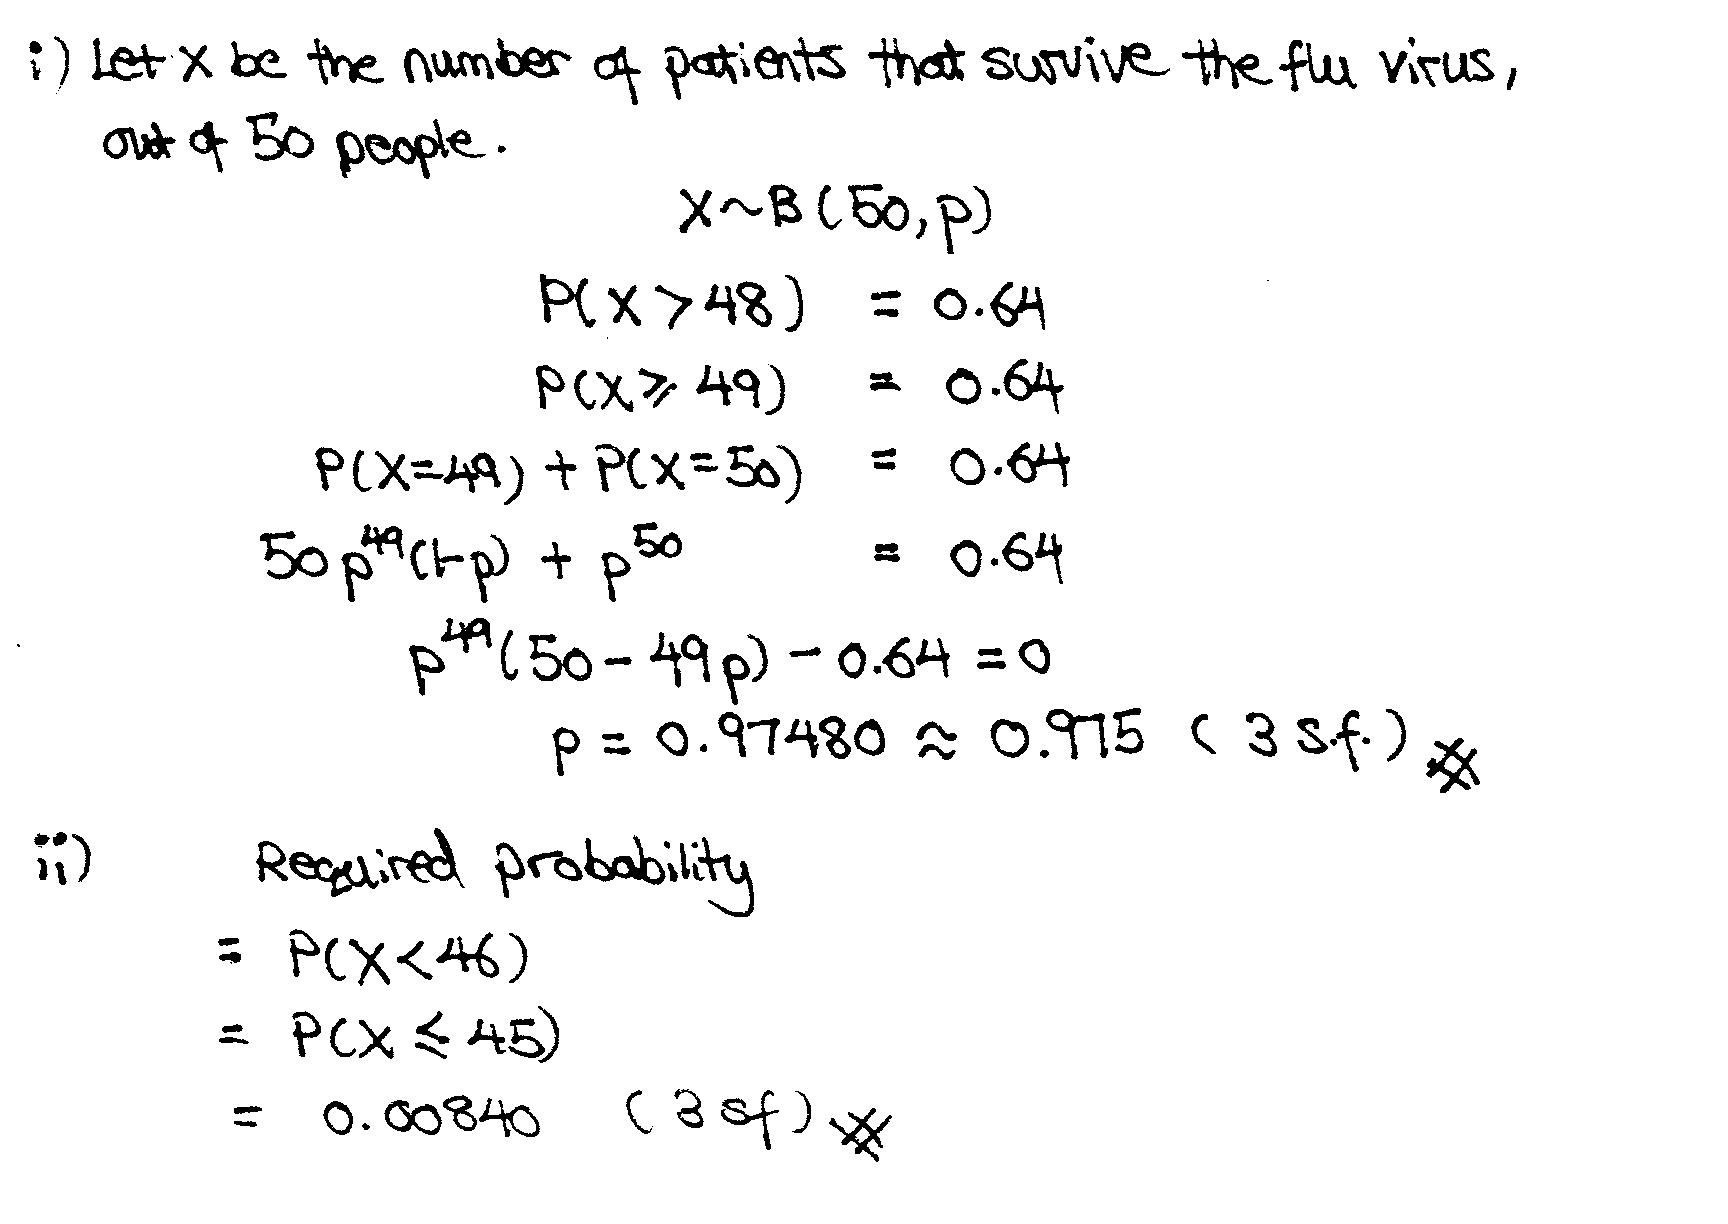 JC Math Specialist Binomial Distribution NYJC 2009 Prelim Solution